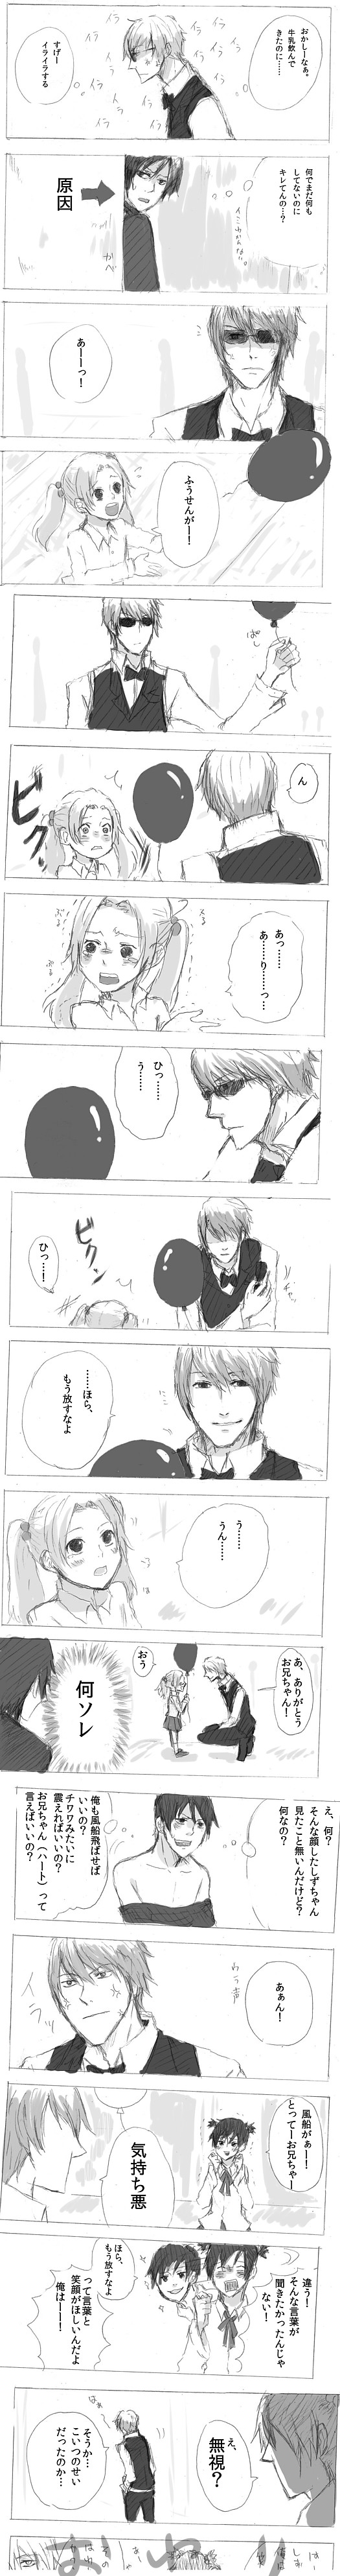 Tags: Anime, DURARARA!!, Heiwajima Shizuo, Orihara Izaya, Comic